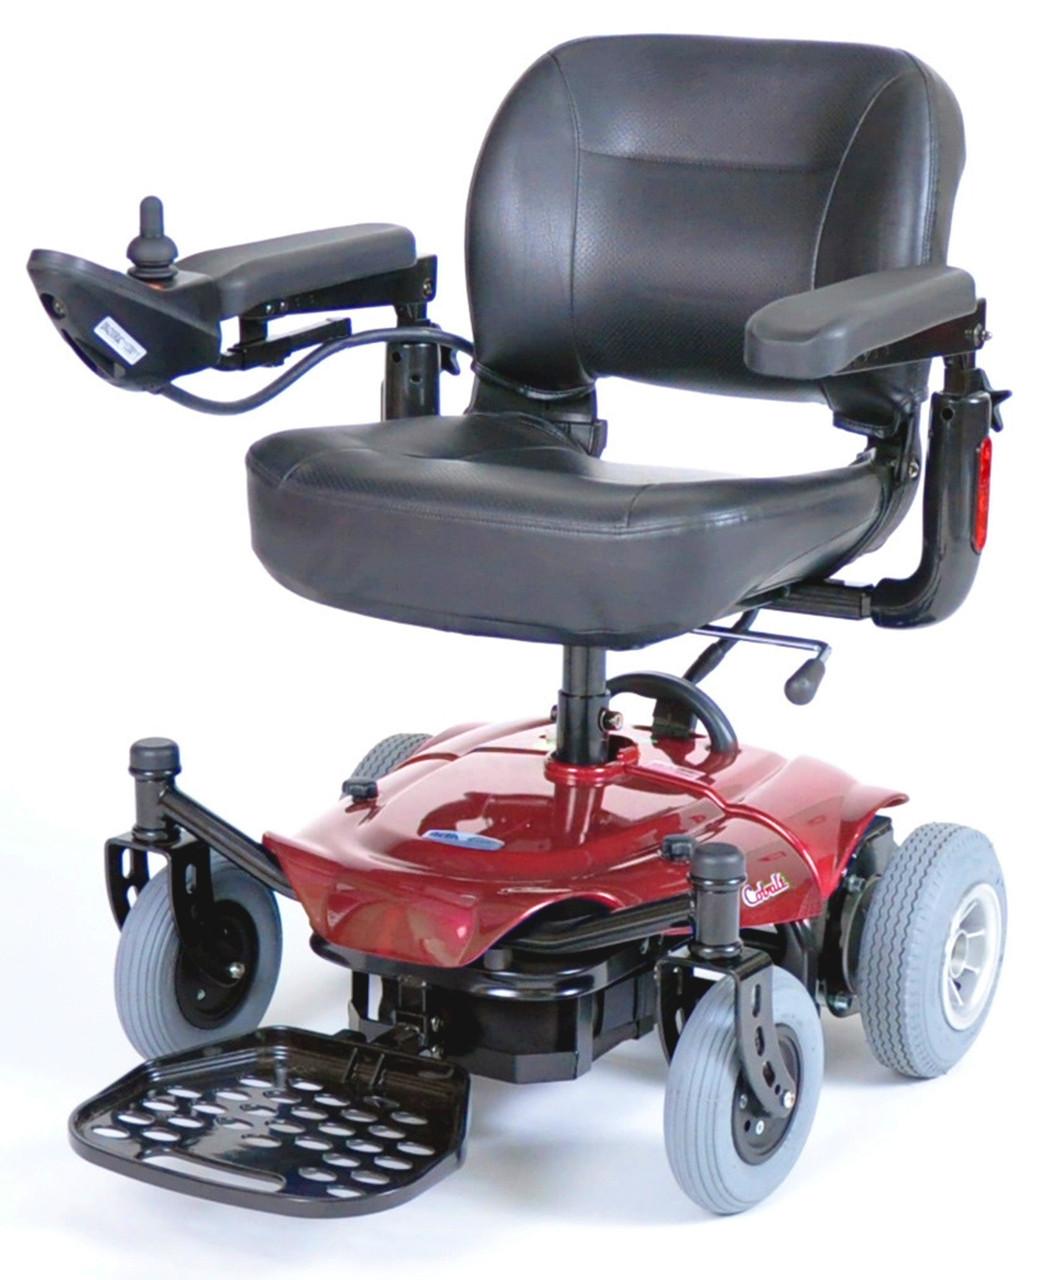 Drive Cobalt Travel Power Wheelchair Red